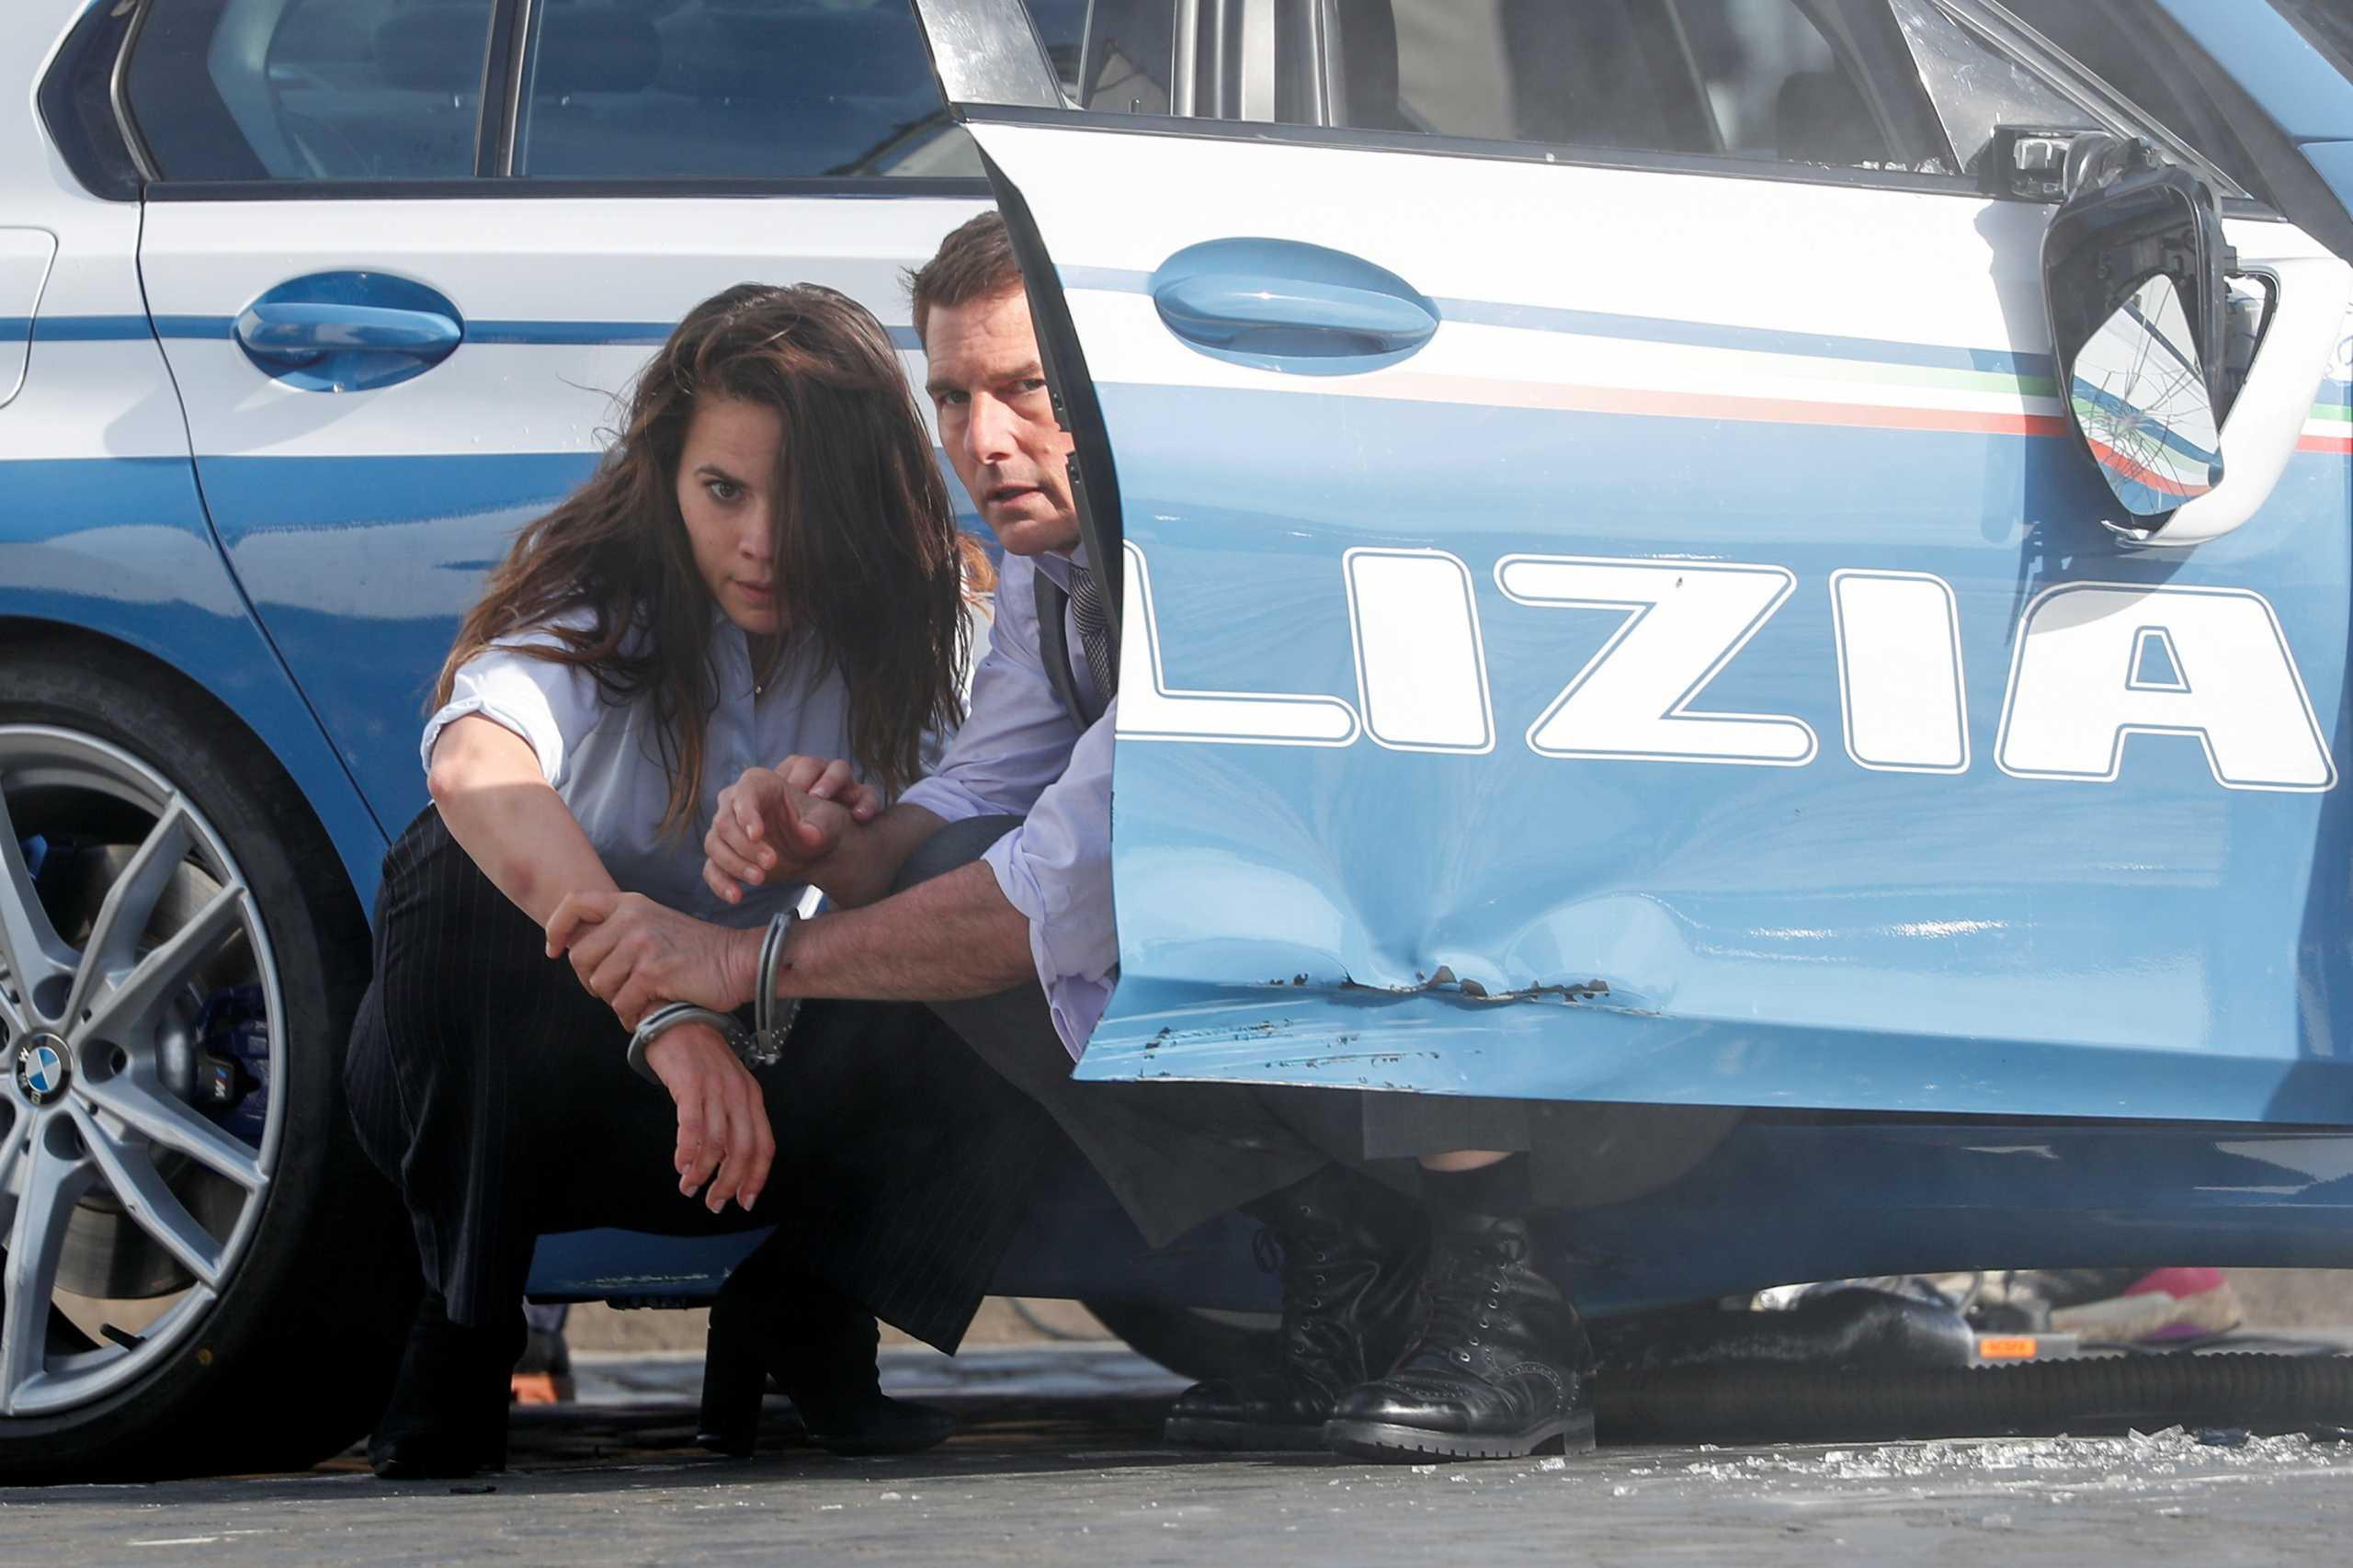 «Mission Impossible 7»: Η Paramount ζητά αποζημίωση για τις διακοπές των γυρισμάτων της ταινίας  λόγω κορονοϊού